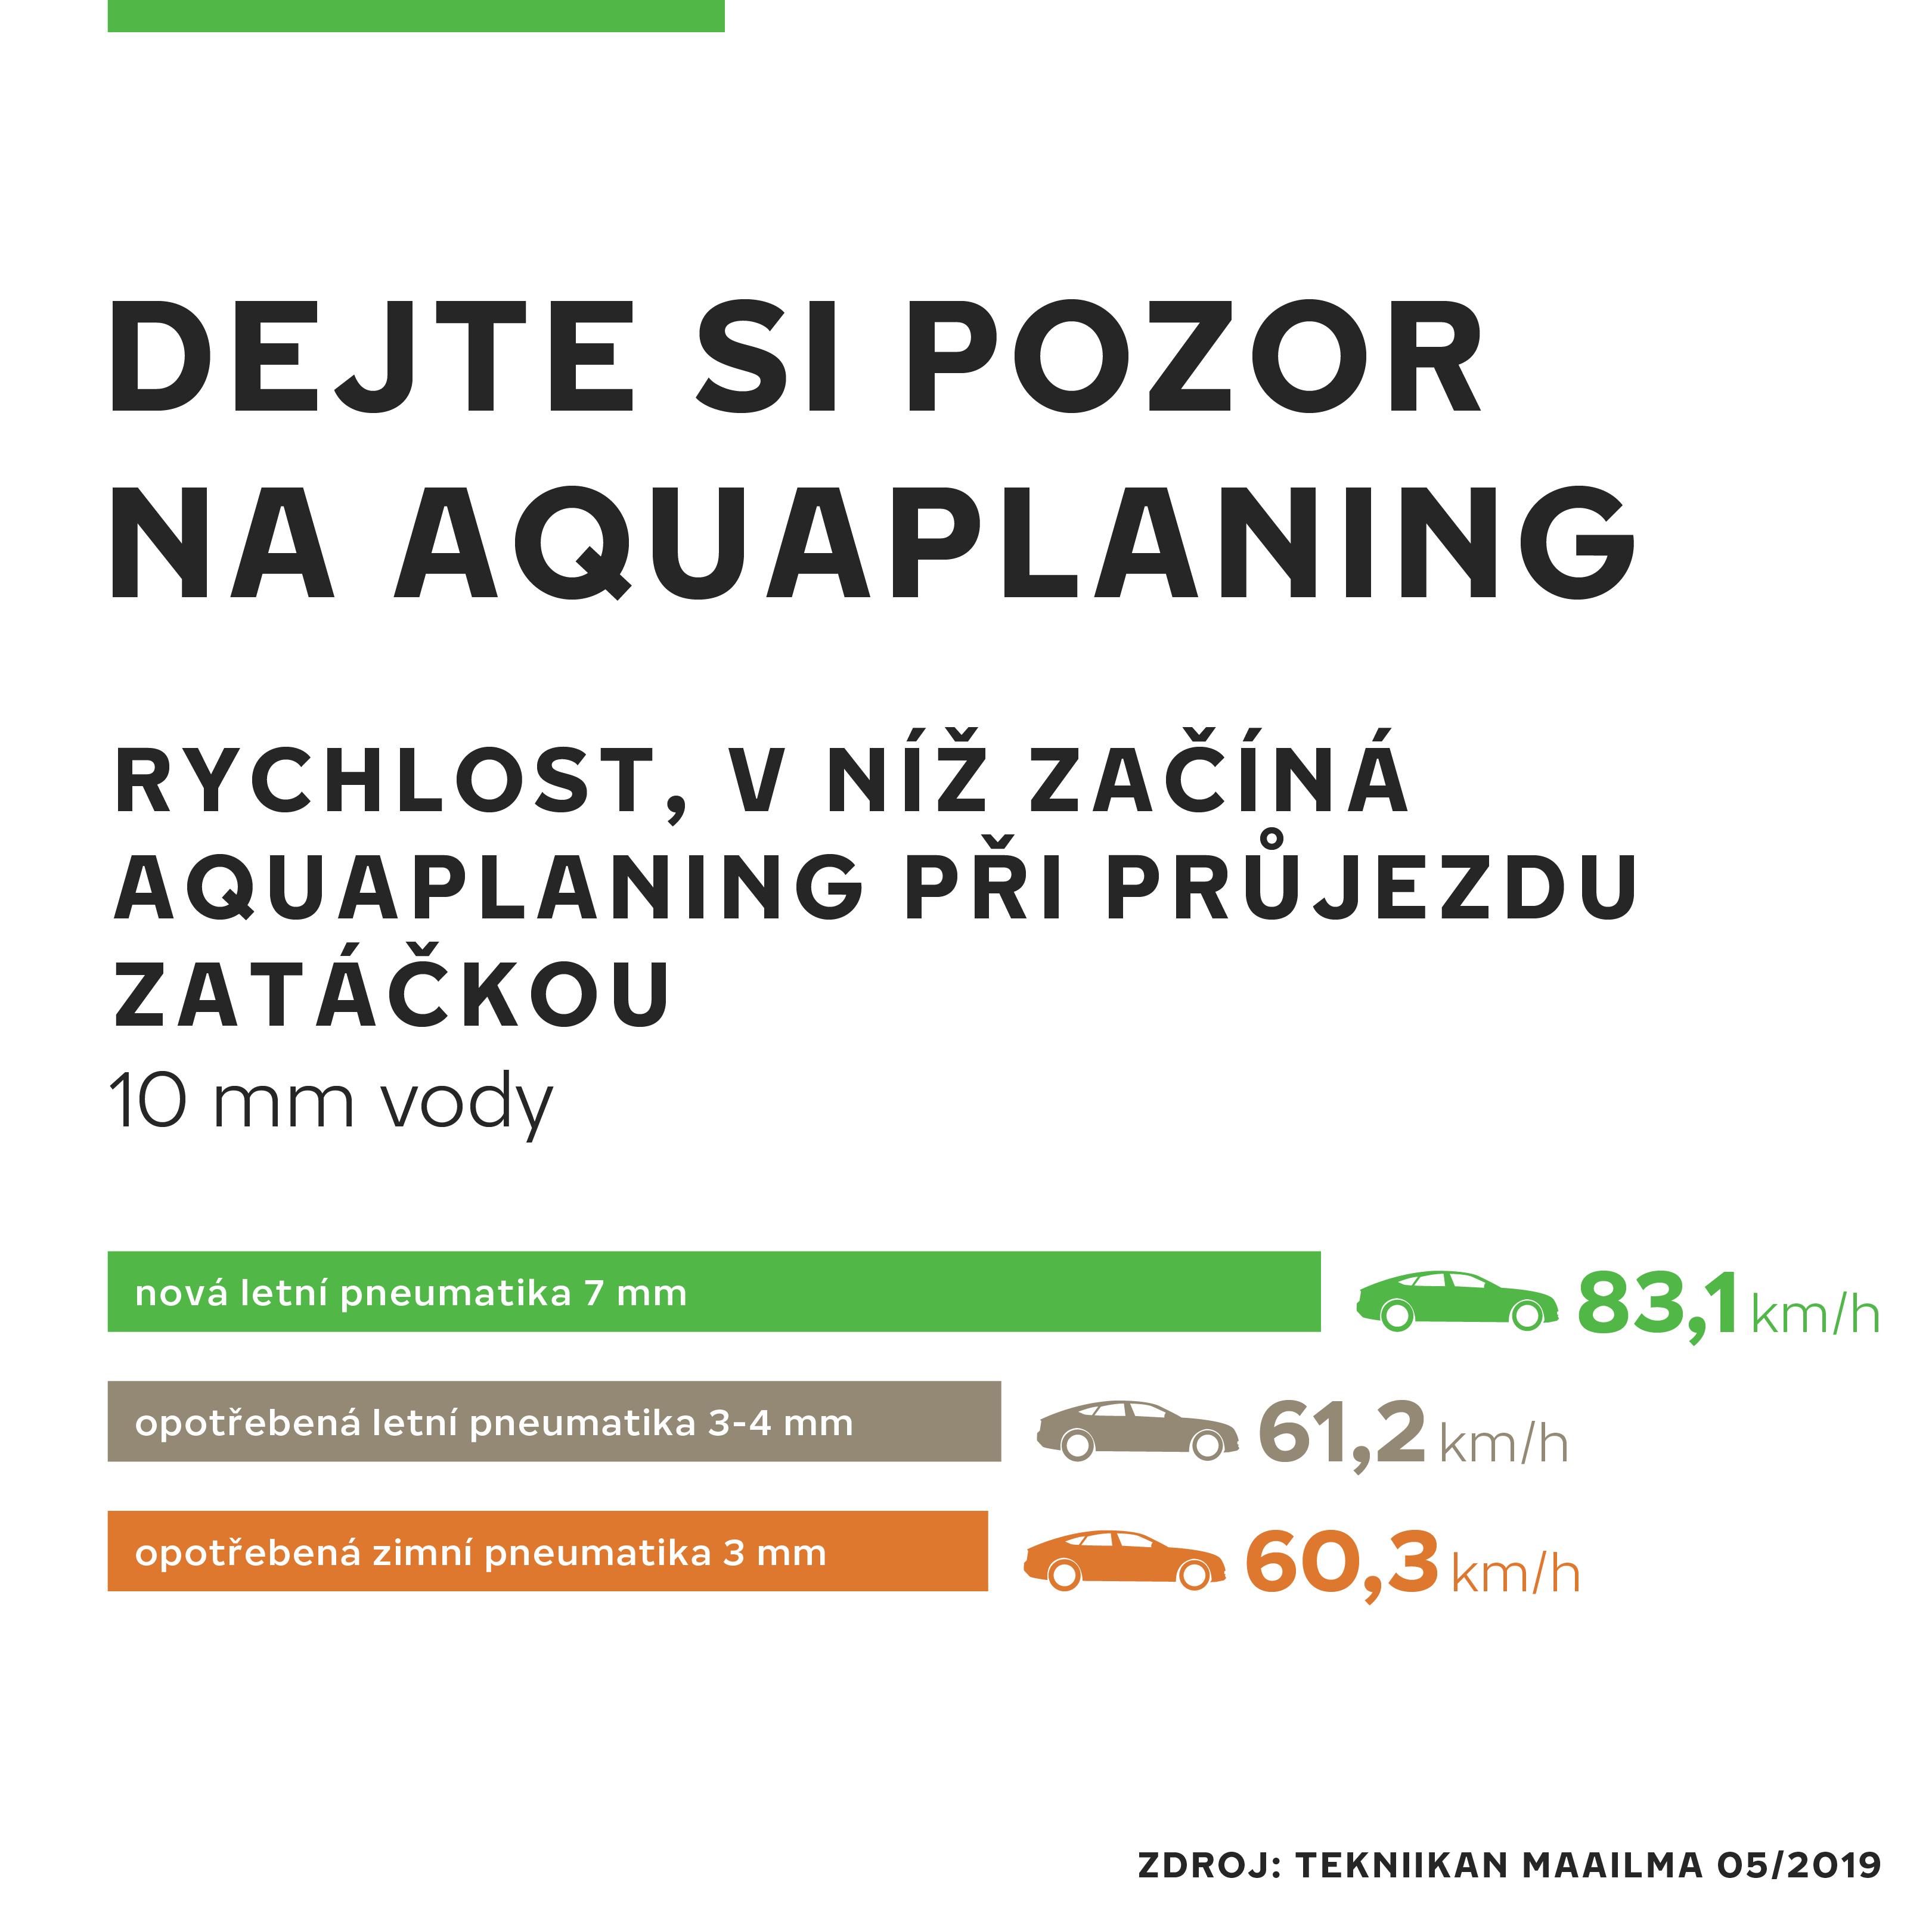 CZ_Aquaplaning_infographic